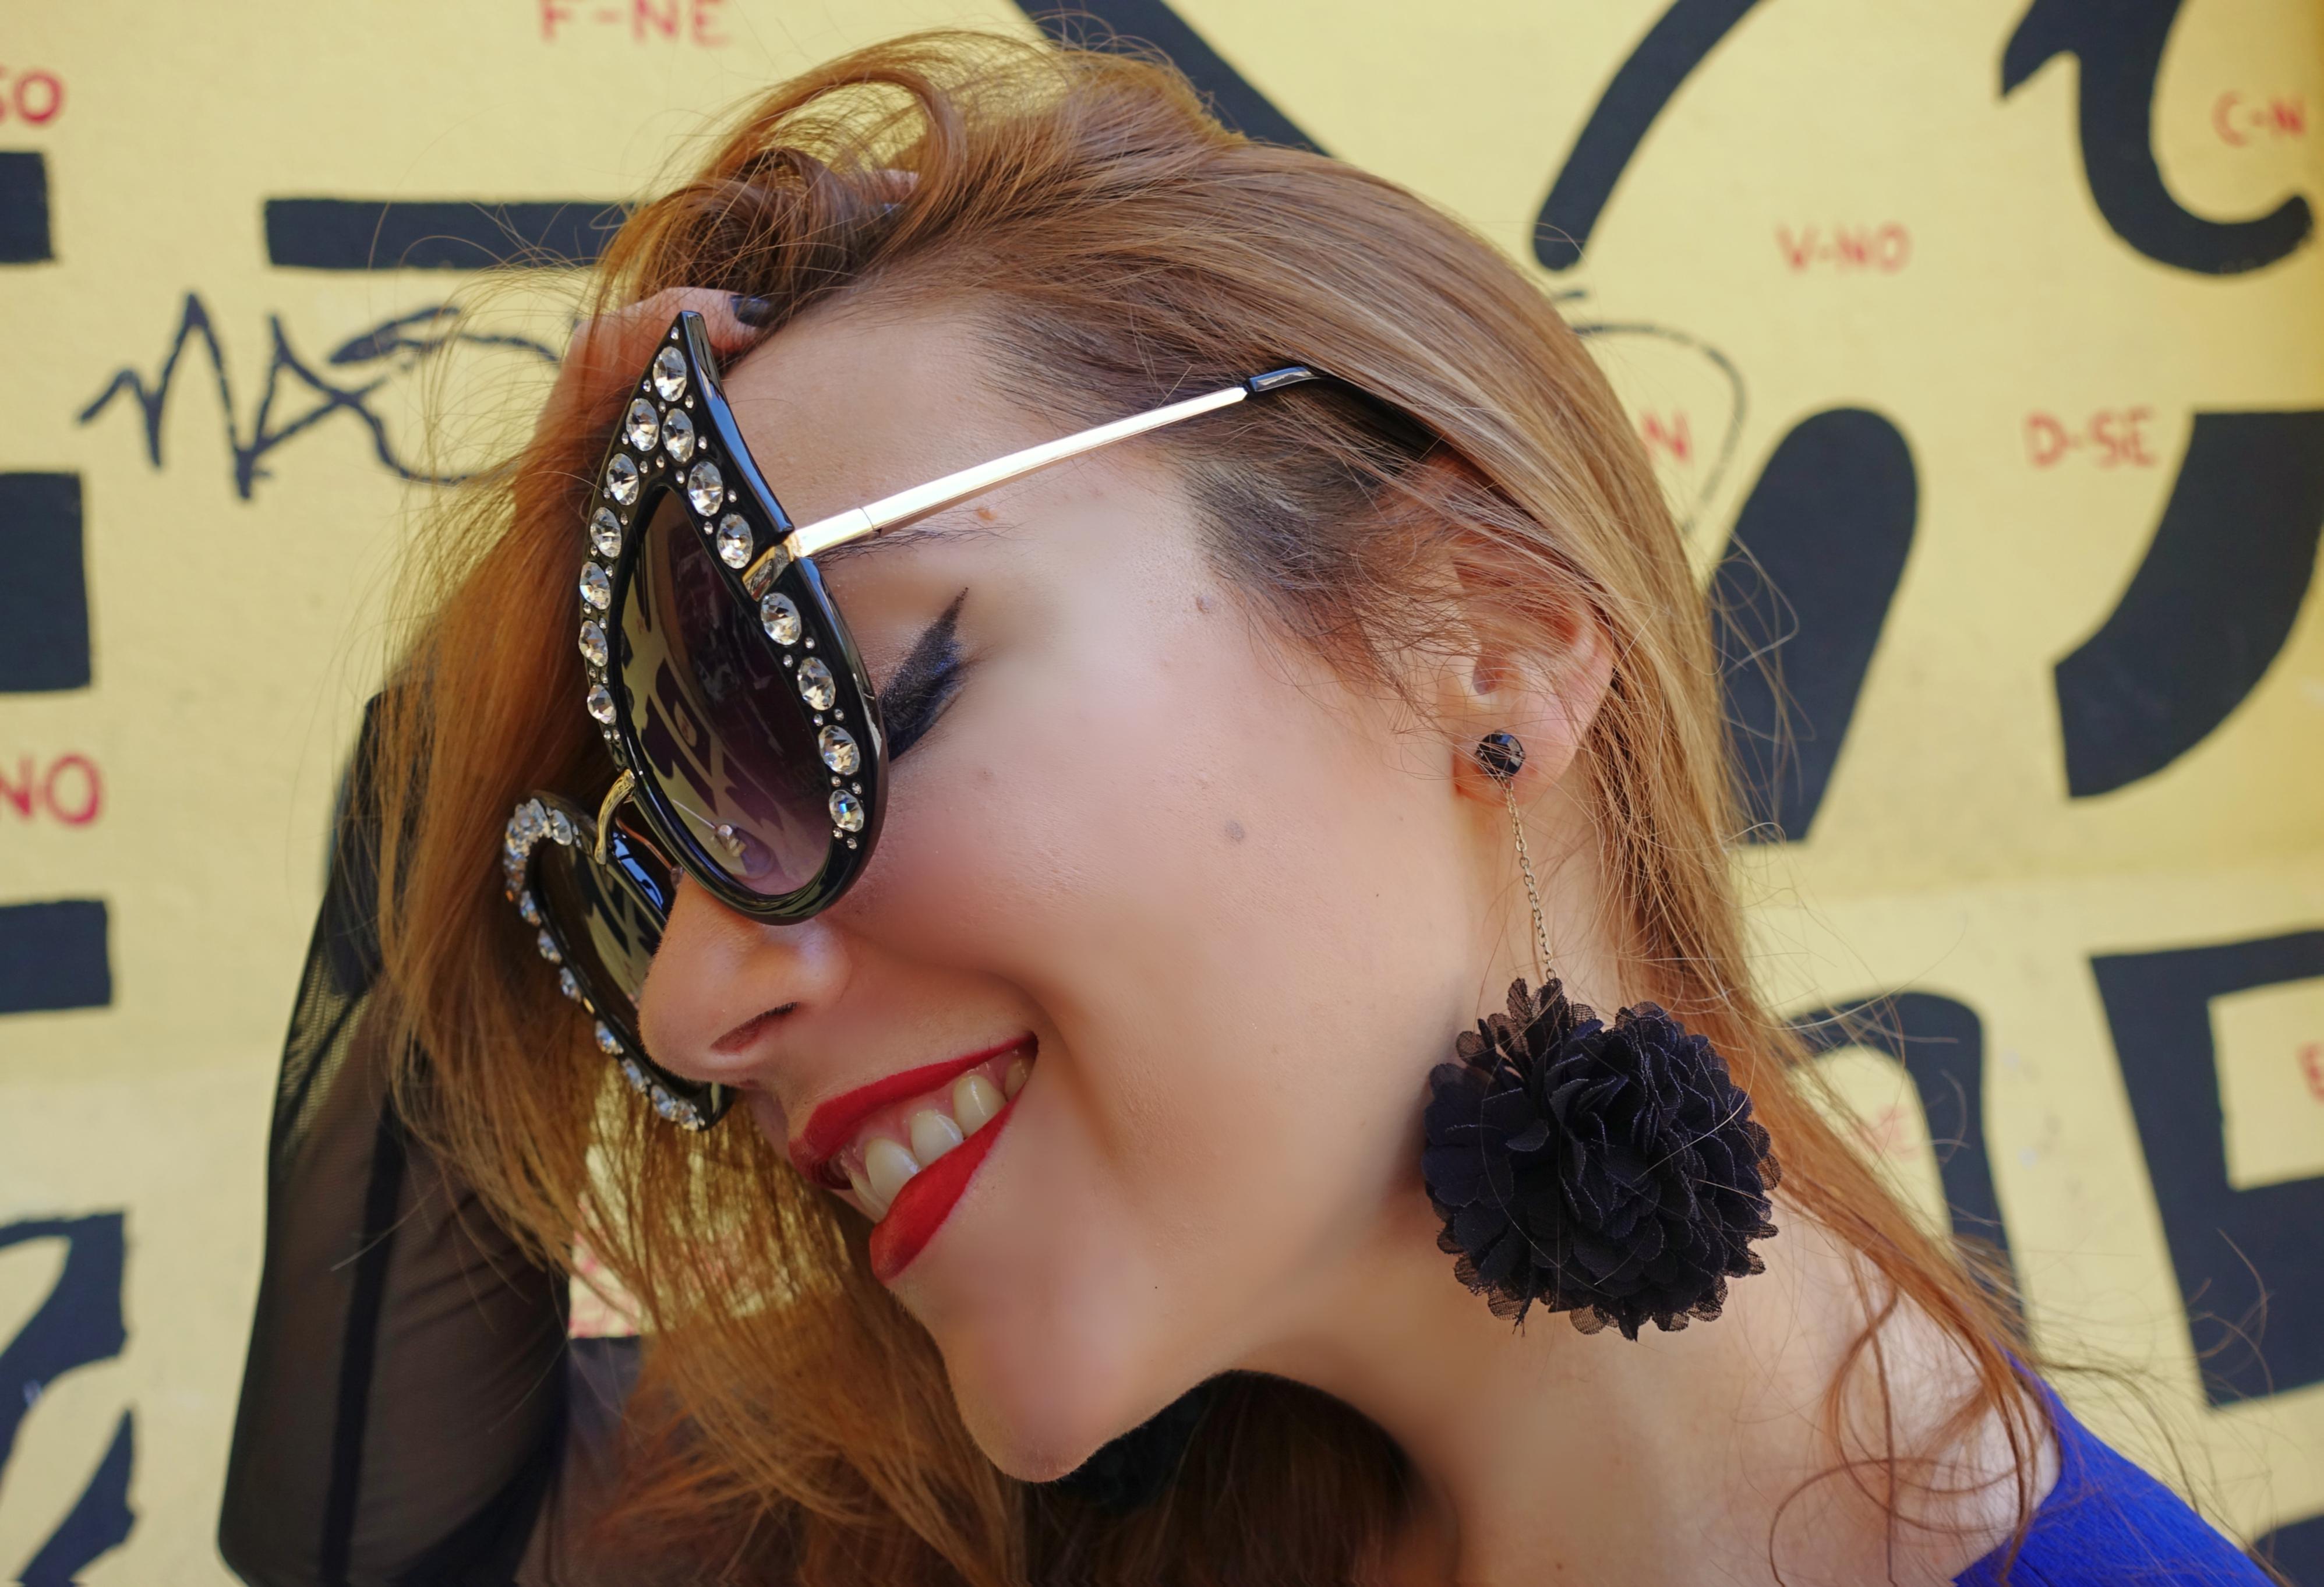 bijou-brigitte-pendientes-largos-ChicAdicta-influencer-Chic-adicta-PiensaenChic-blog-de-moda-Piensa-en-Chic-summer-sunglasses